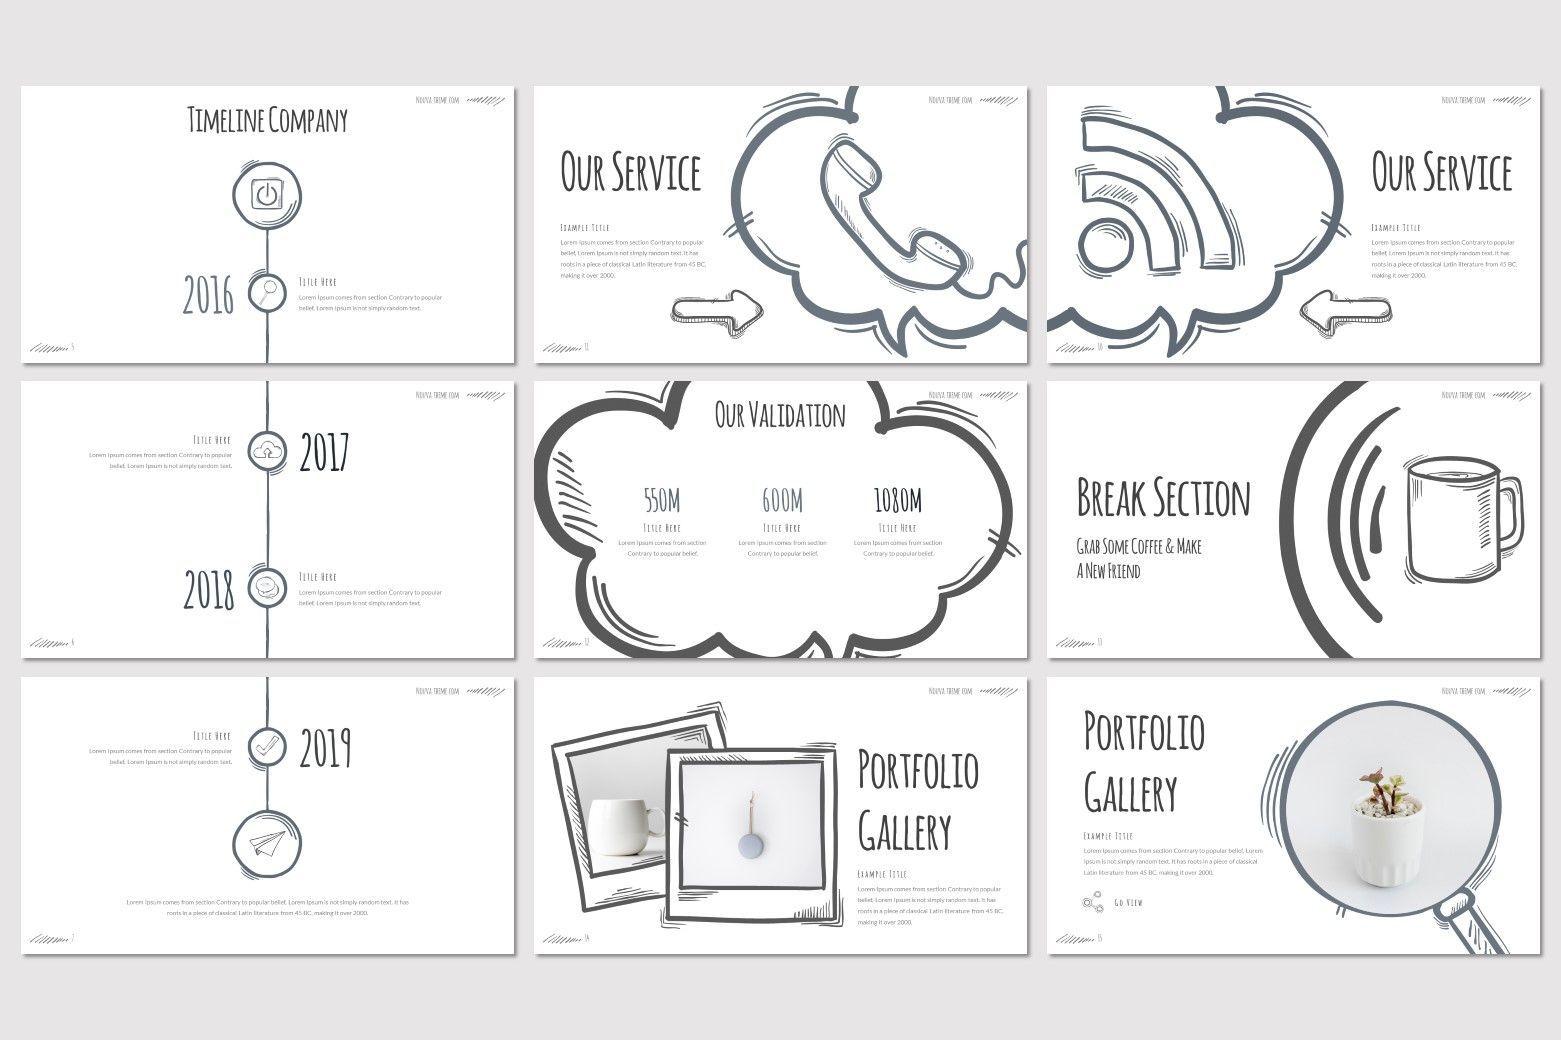 Nouva - Google Slides Template, Slide 3, 08269, Presentation Templates — PoweredTemplate.com